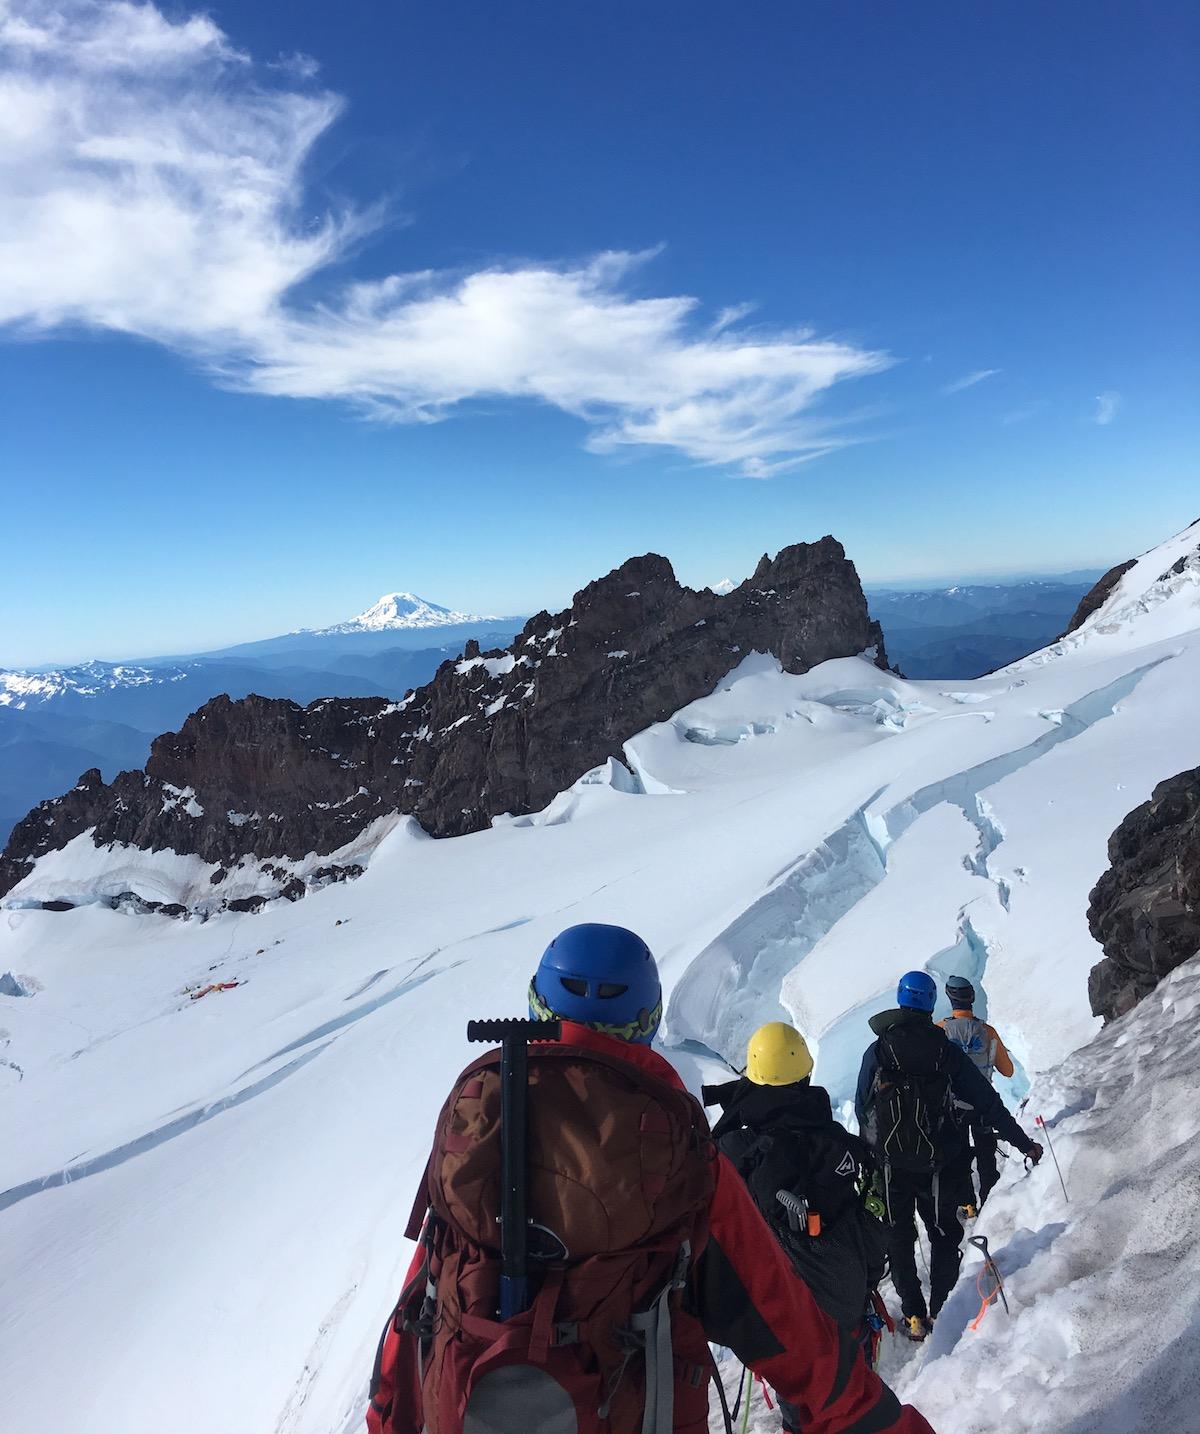 A rope team treks through the snow on Mt. Rainier